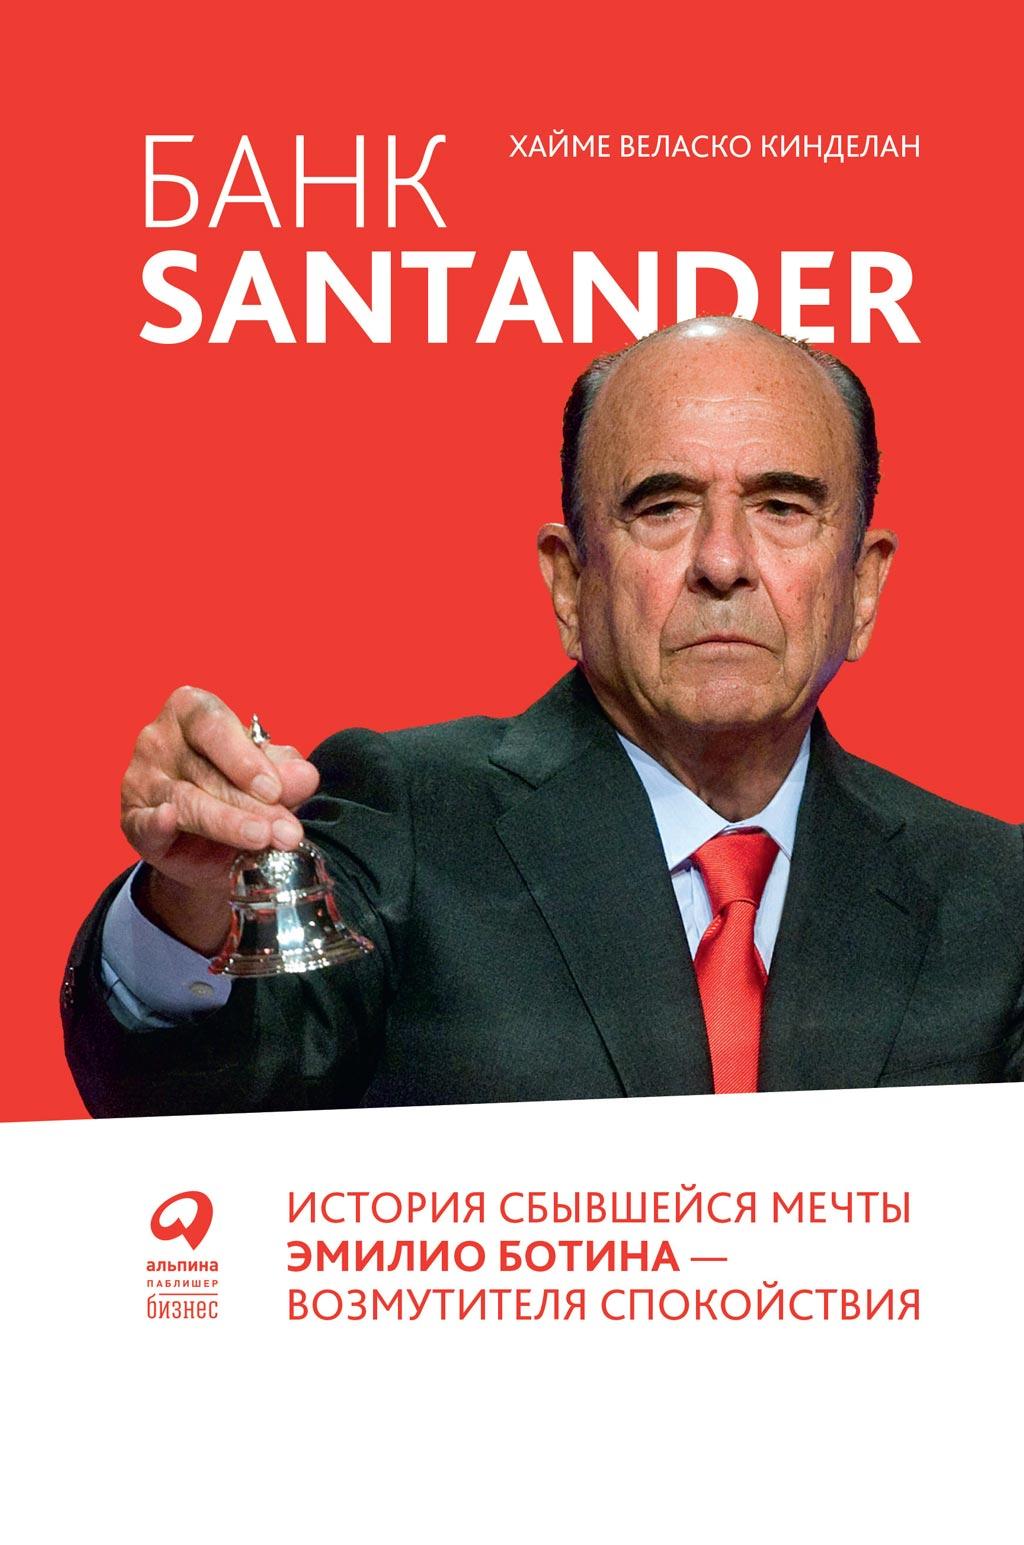 Хайме Кинделан Банк Santander toros santander martes